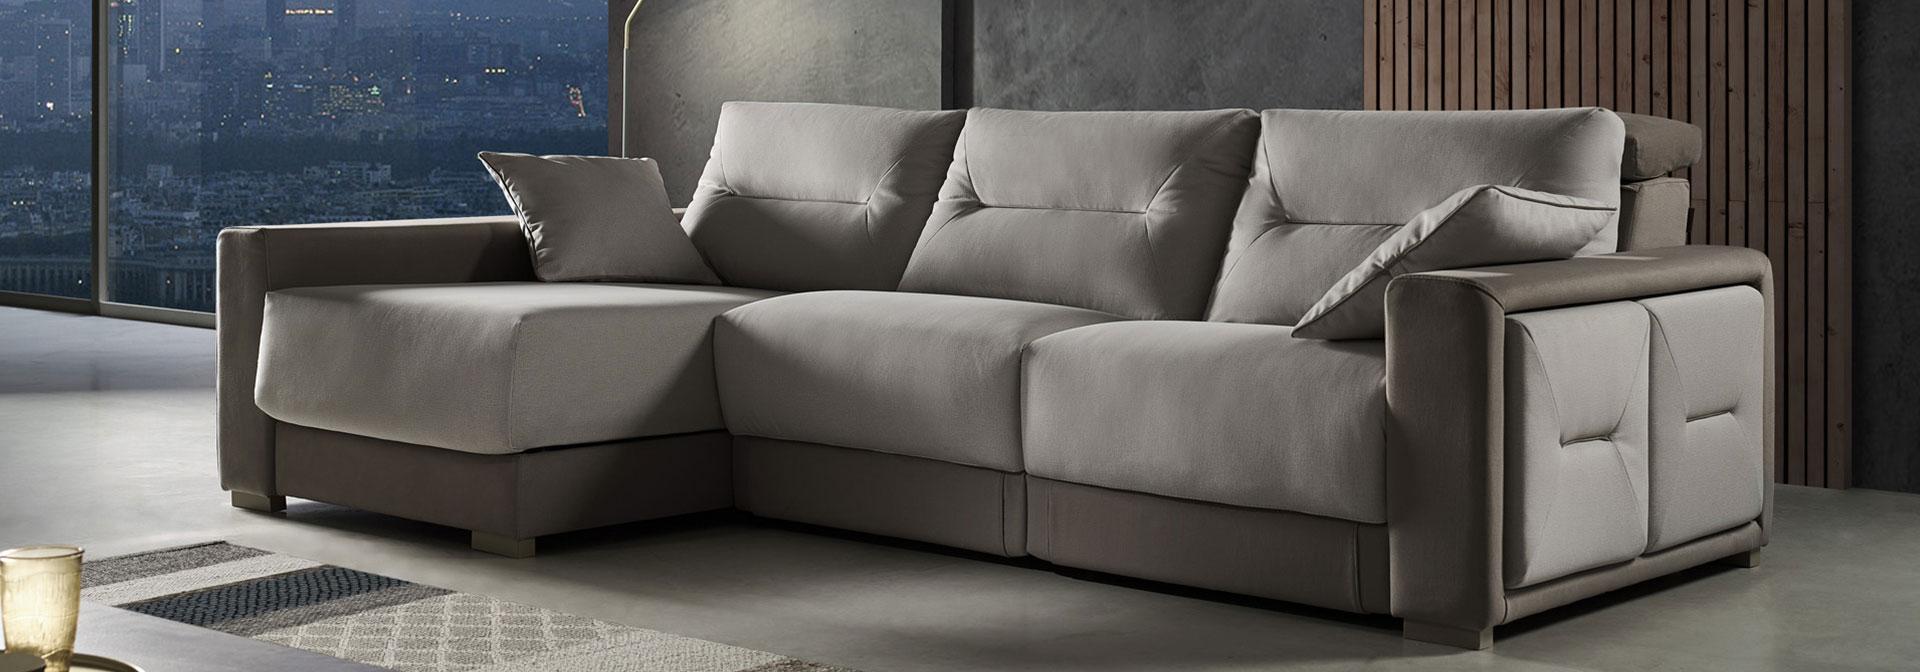 Sofa arlet acomodel1